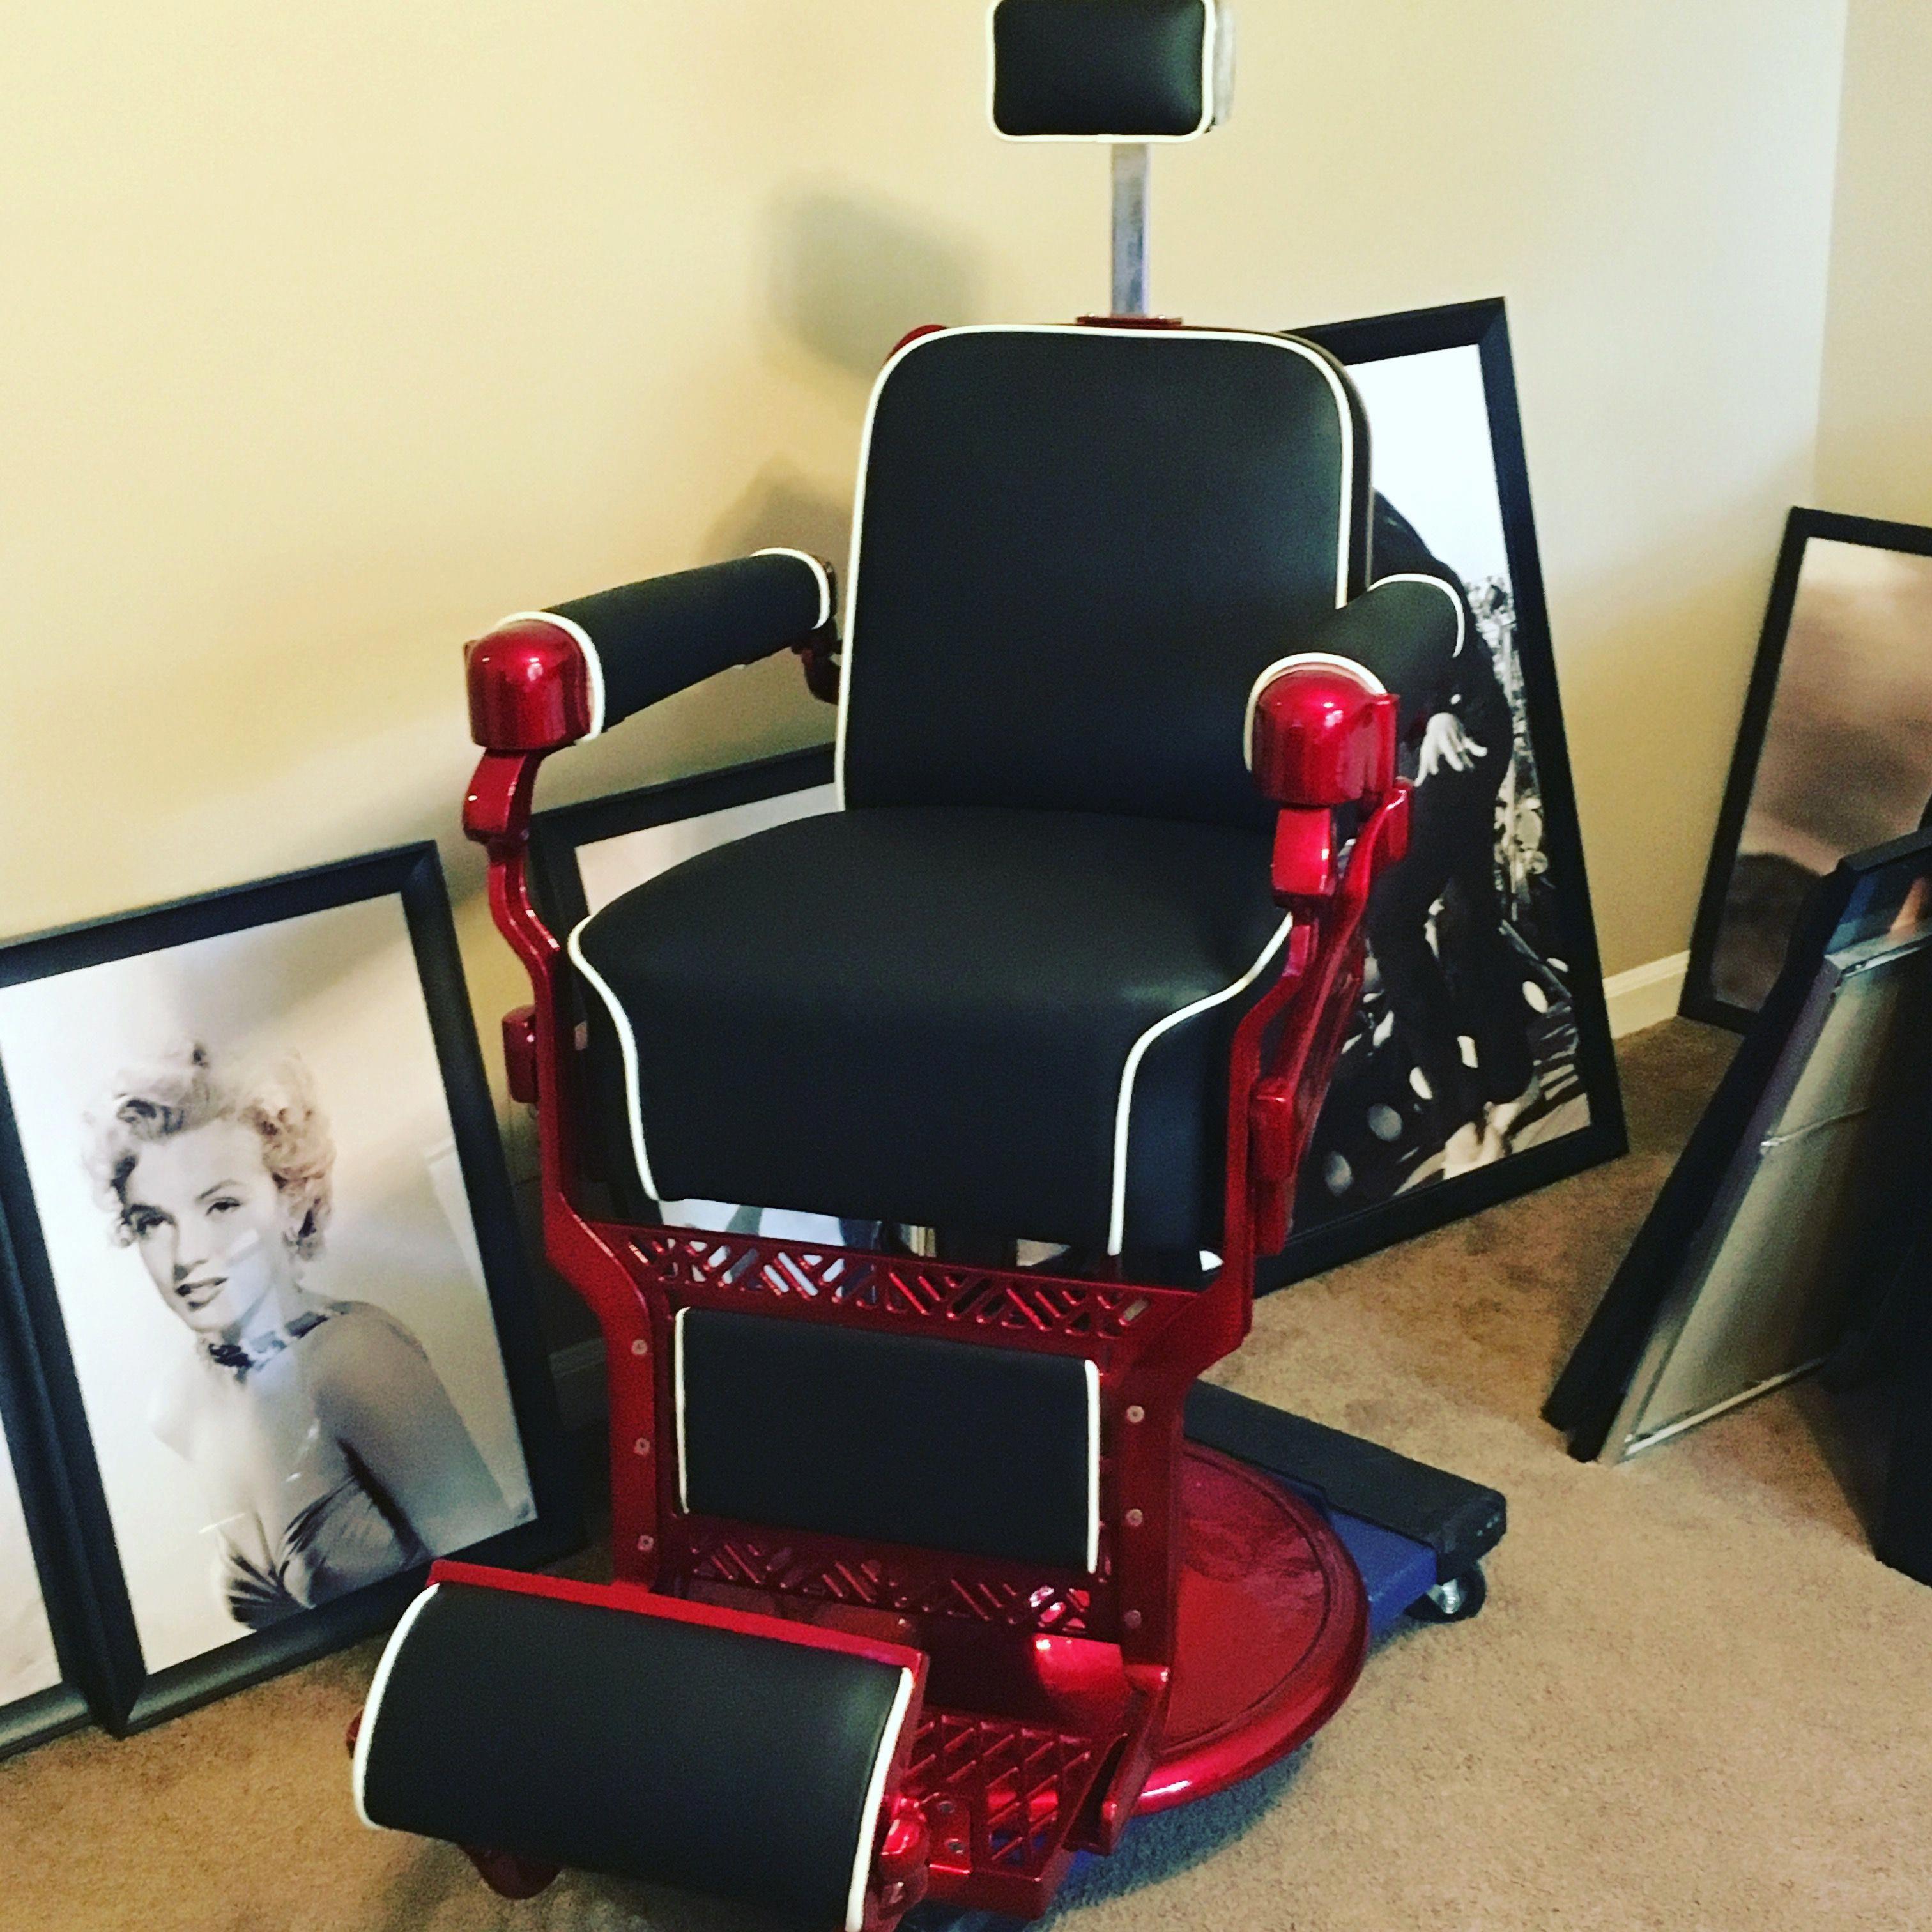 Herman Miller Aeron Chair Size B Chairfloorprotectors Handwerker